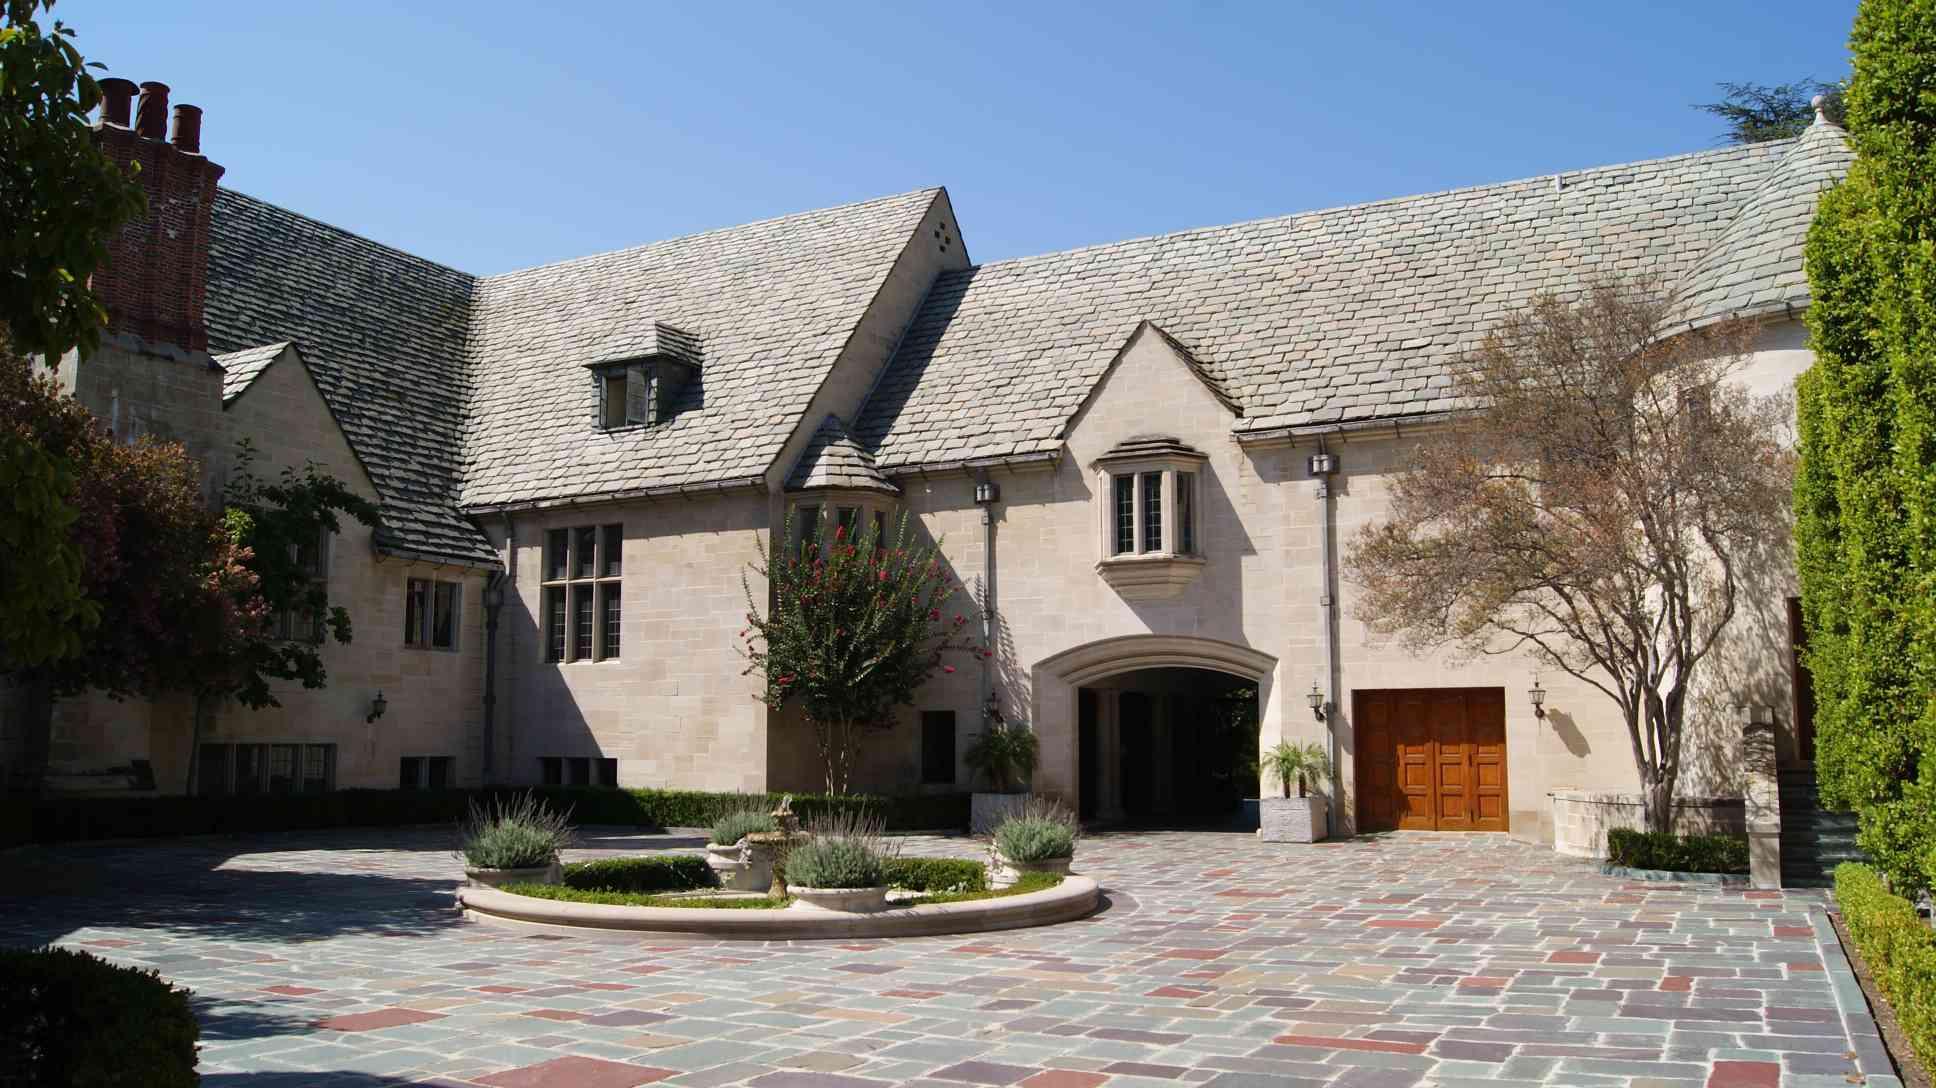 Greystone Mansion in Beverly Hills